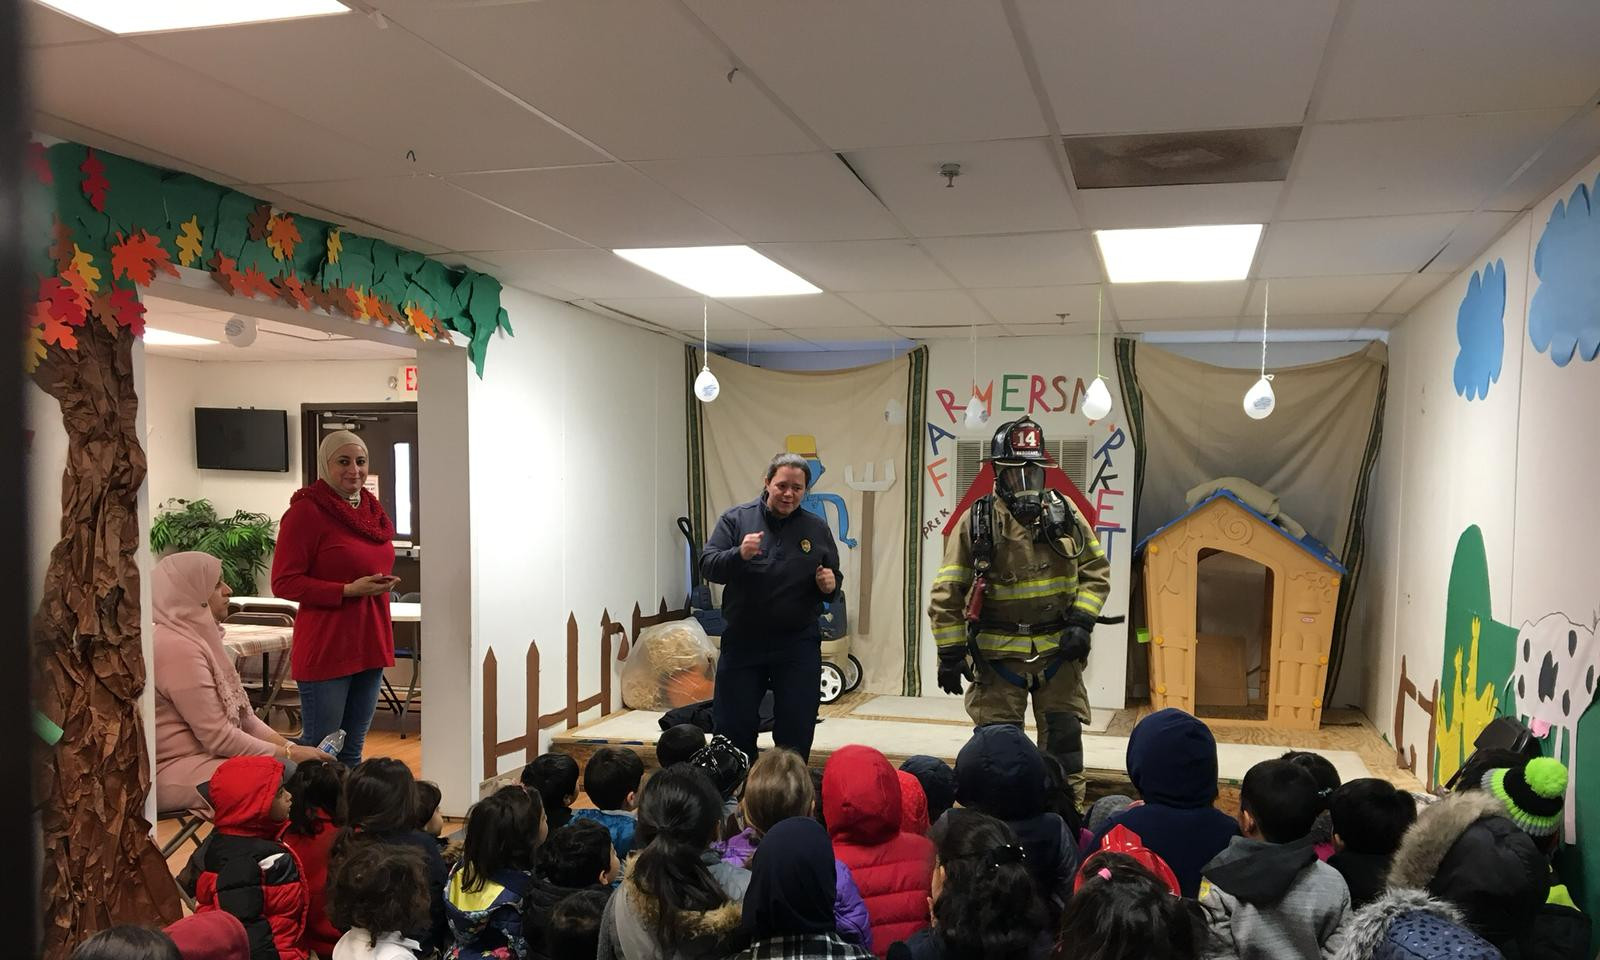 Forsyth Fire Department